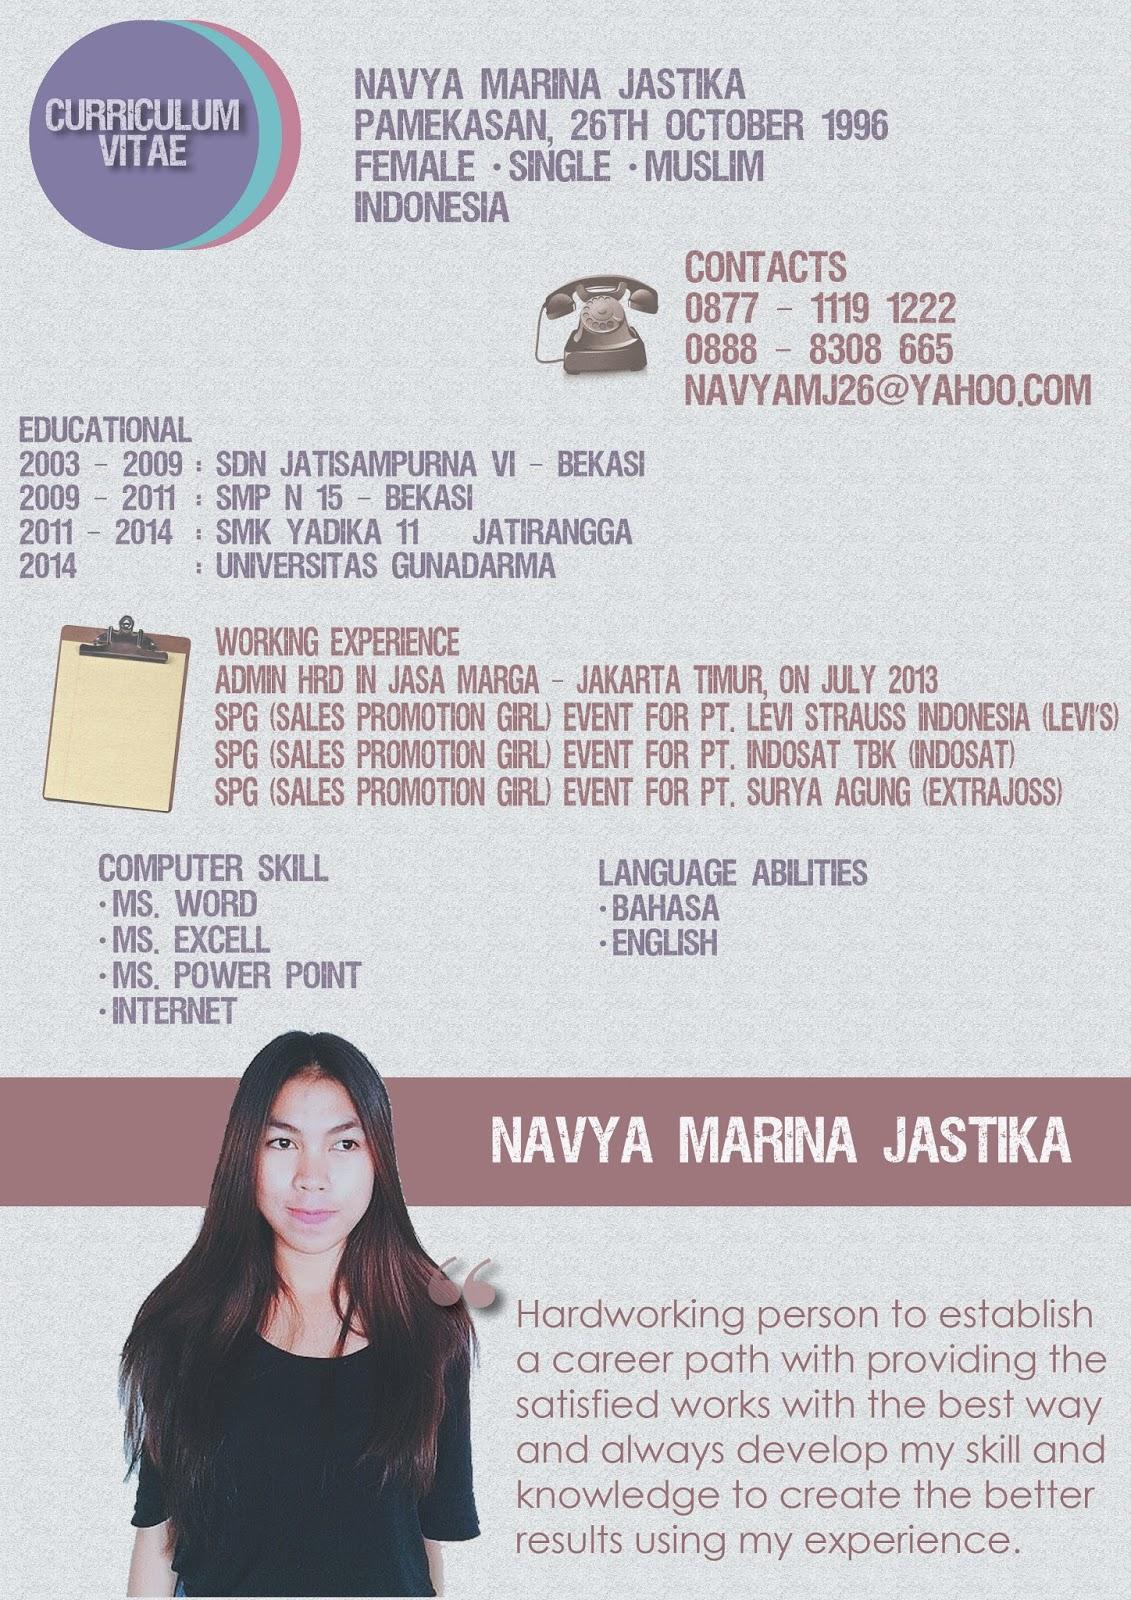 Application cover letter academic job